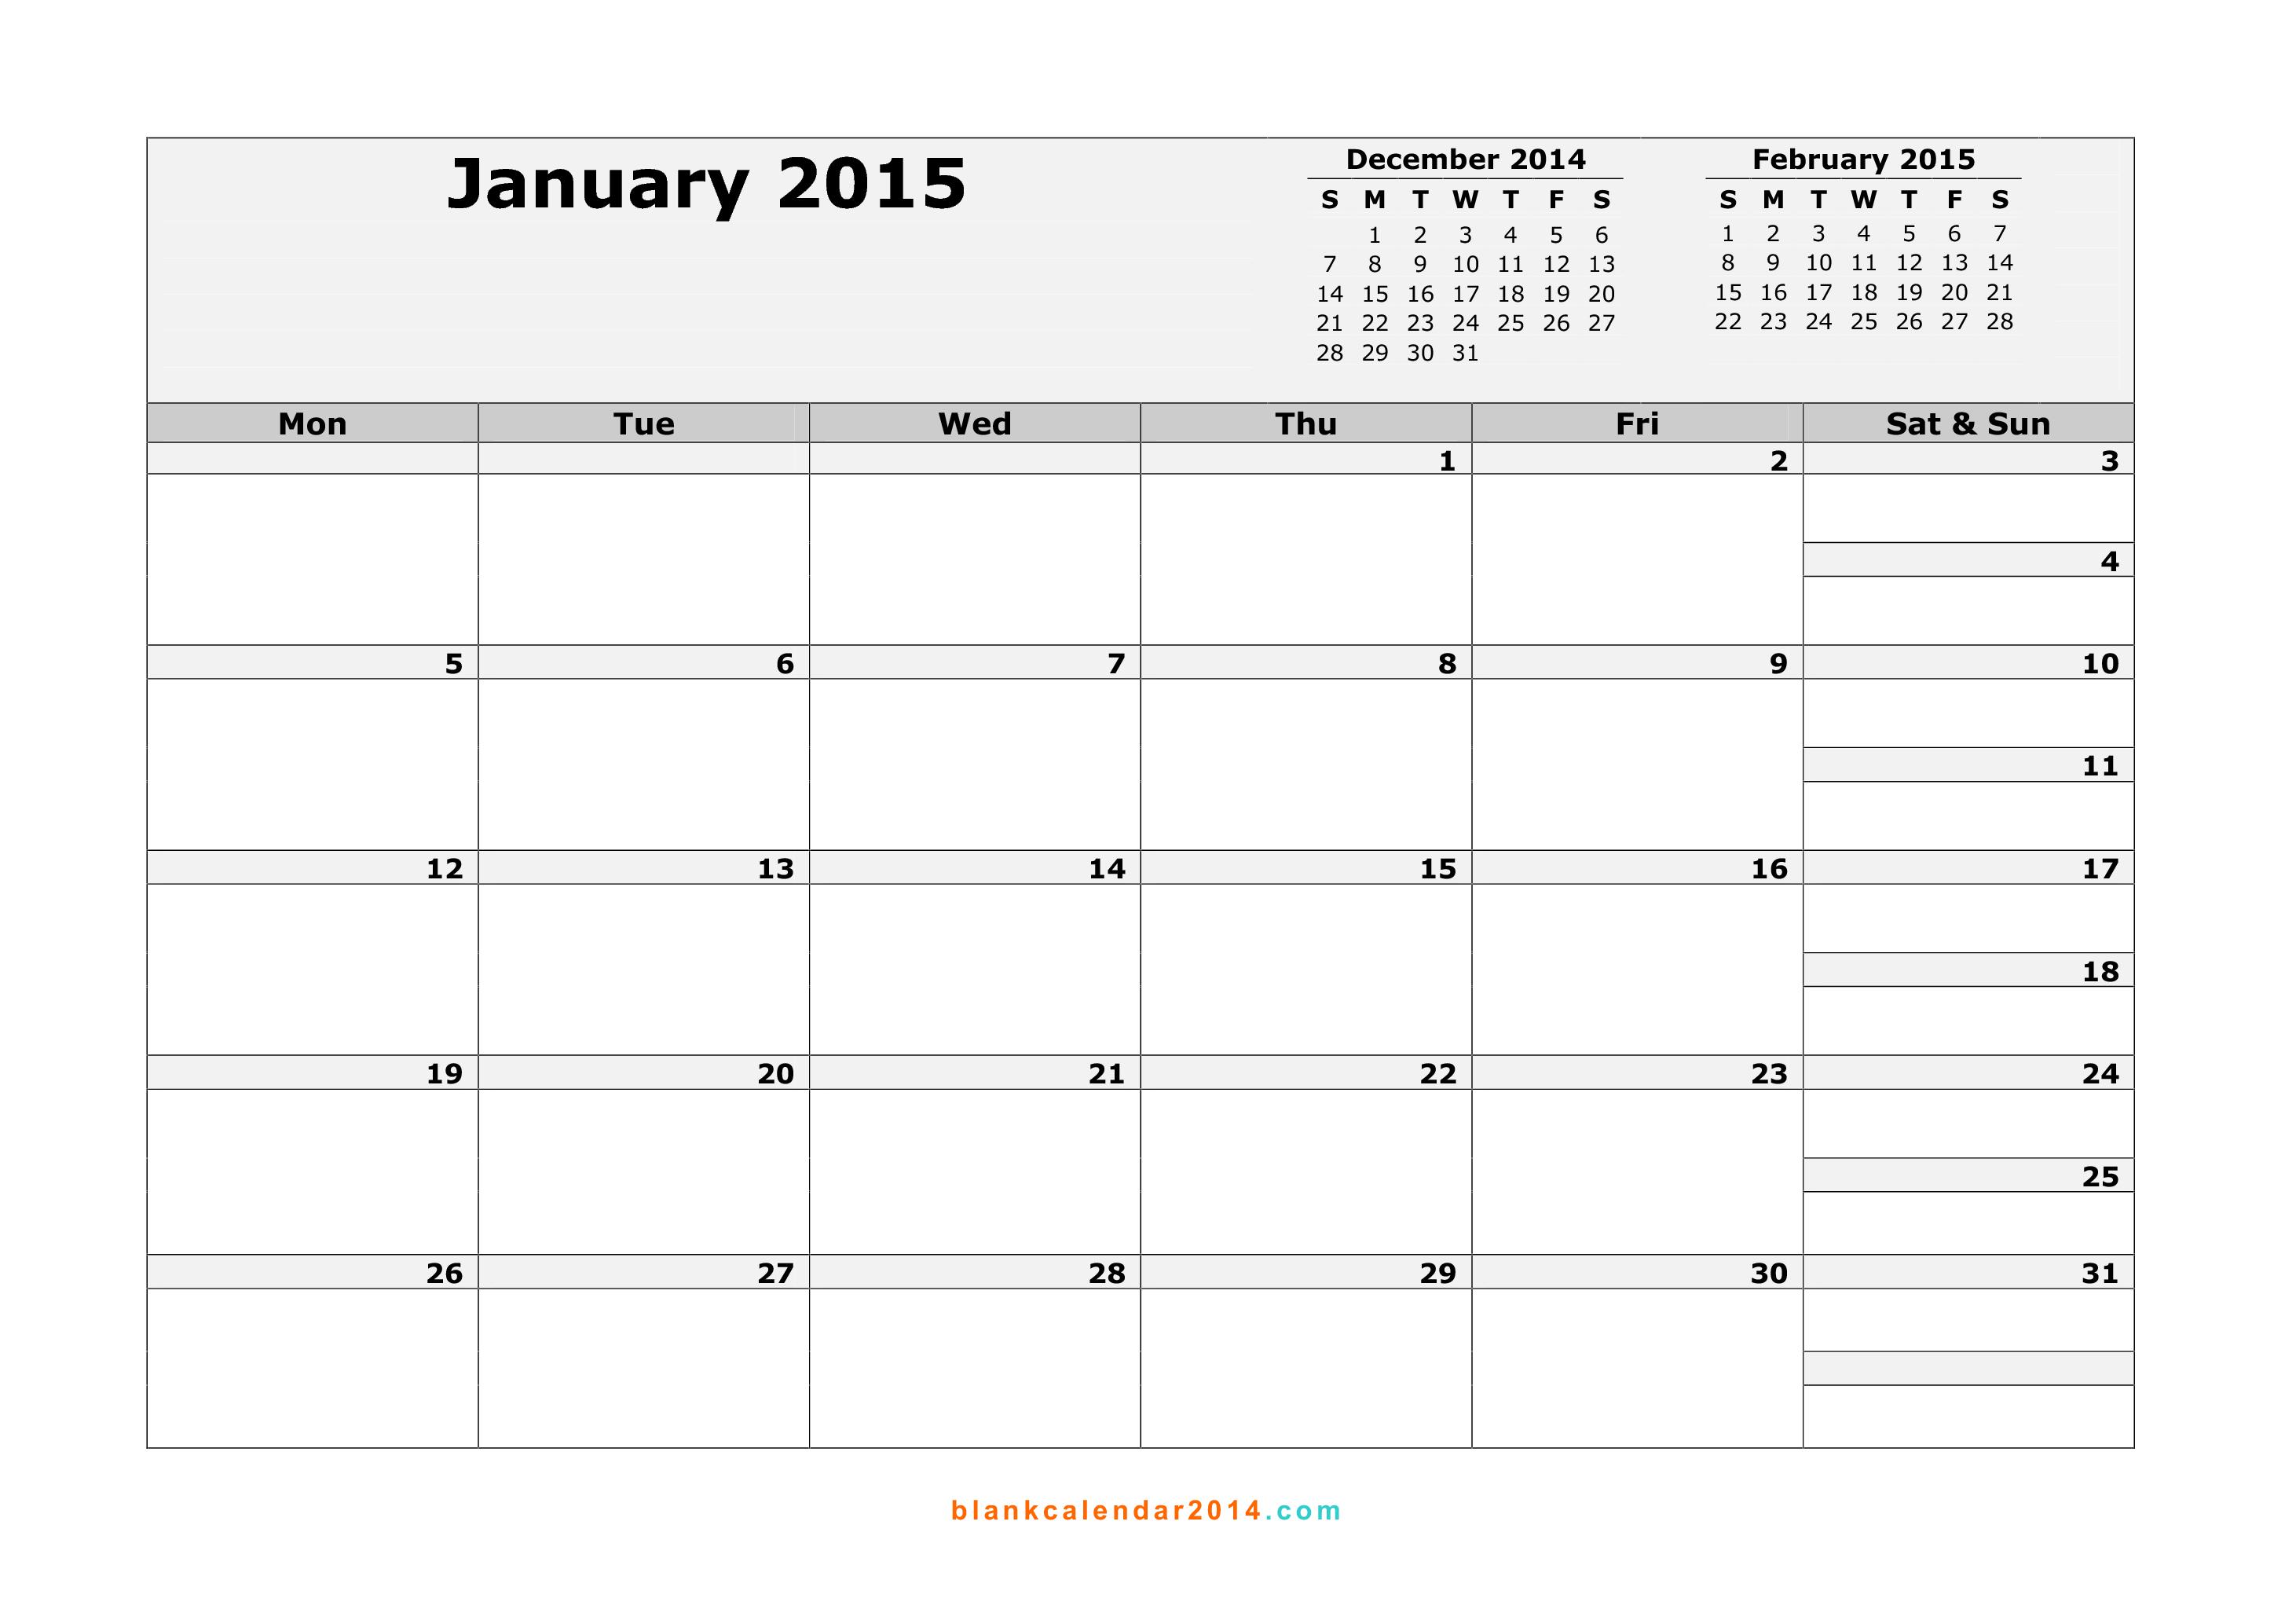 January 2015 Calendar – Free Printable Calendar Templates 2 | Chainimage regarding Editable 2015 Monthly Calendar Template